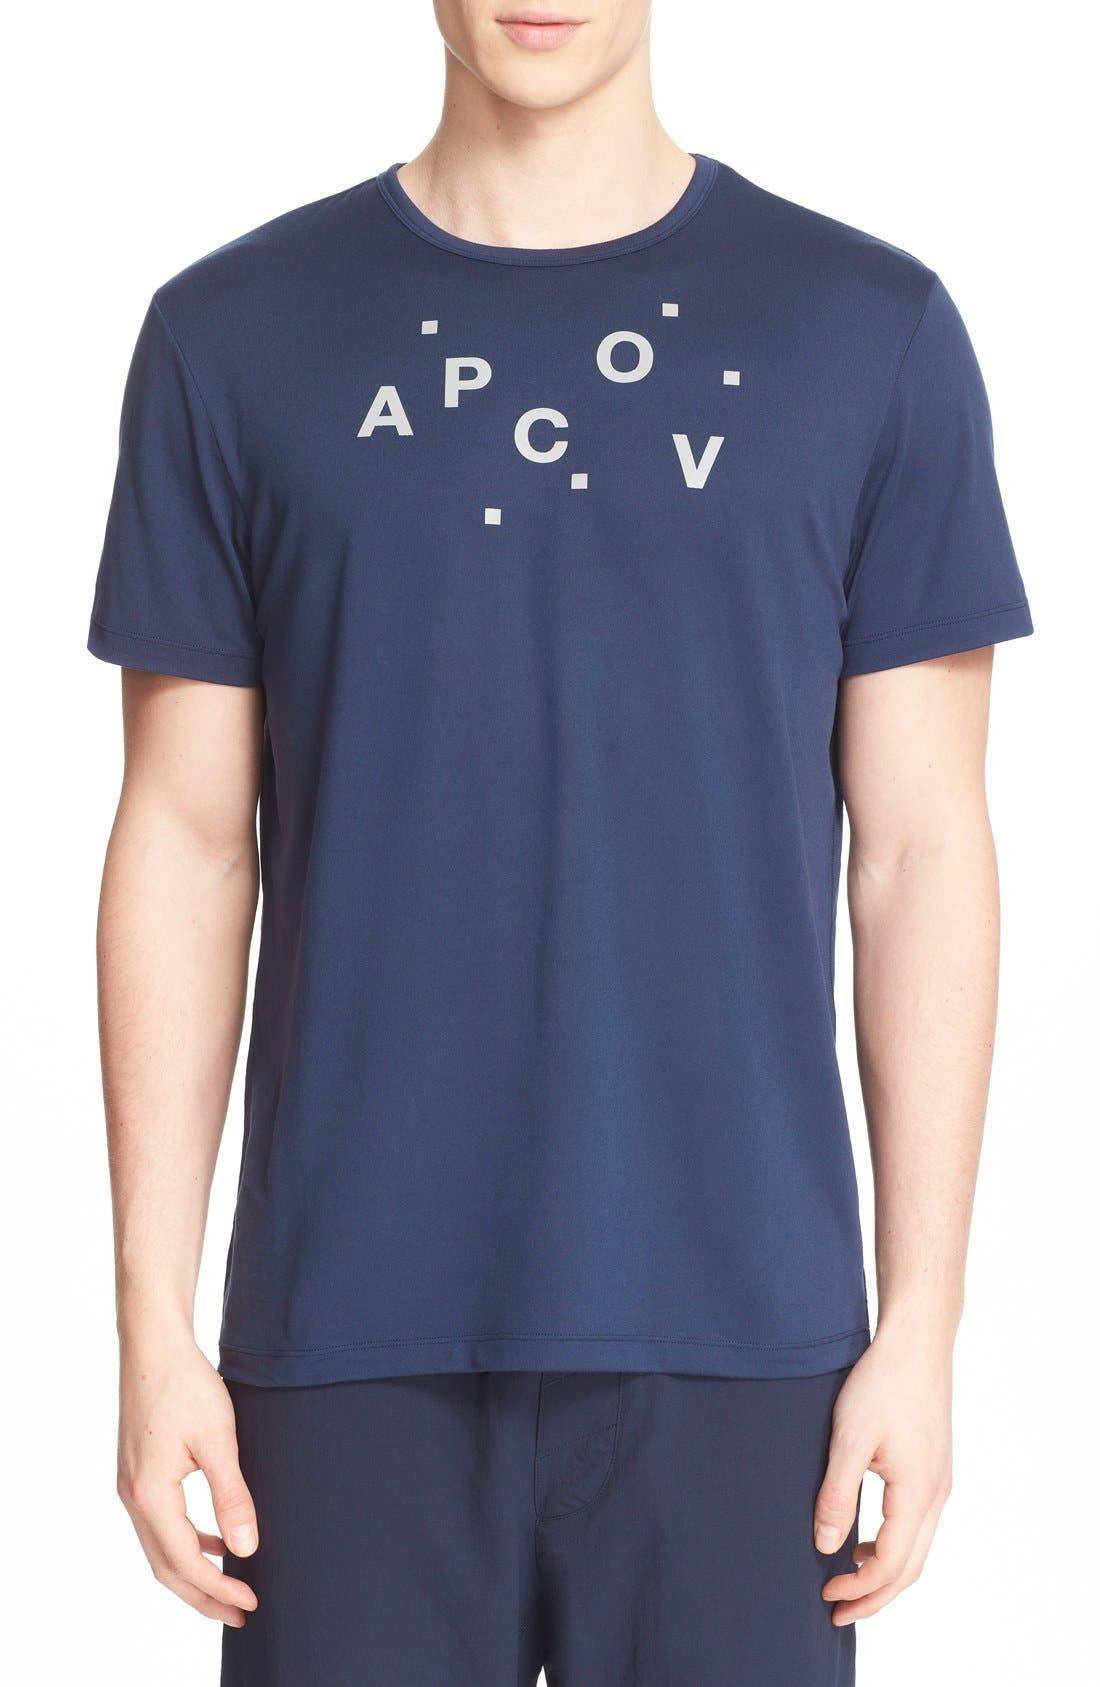 and Outdoor Voices 'Austin' Crewneck Logo T-Shirt, Main, color, 410